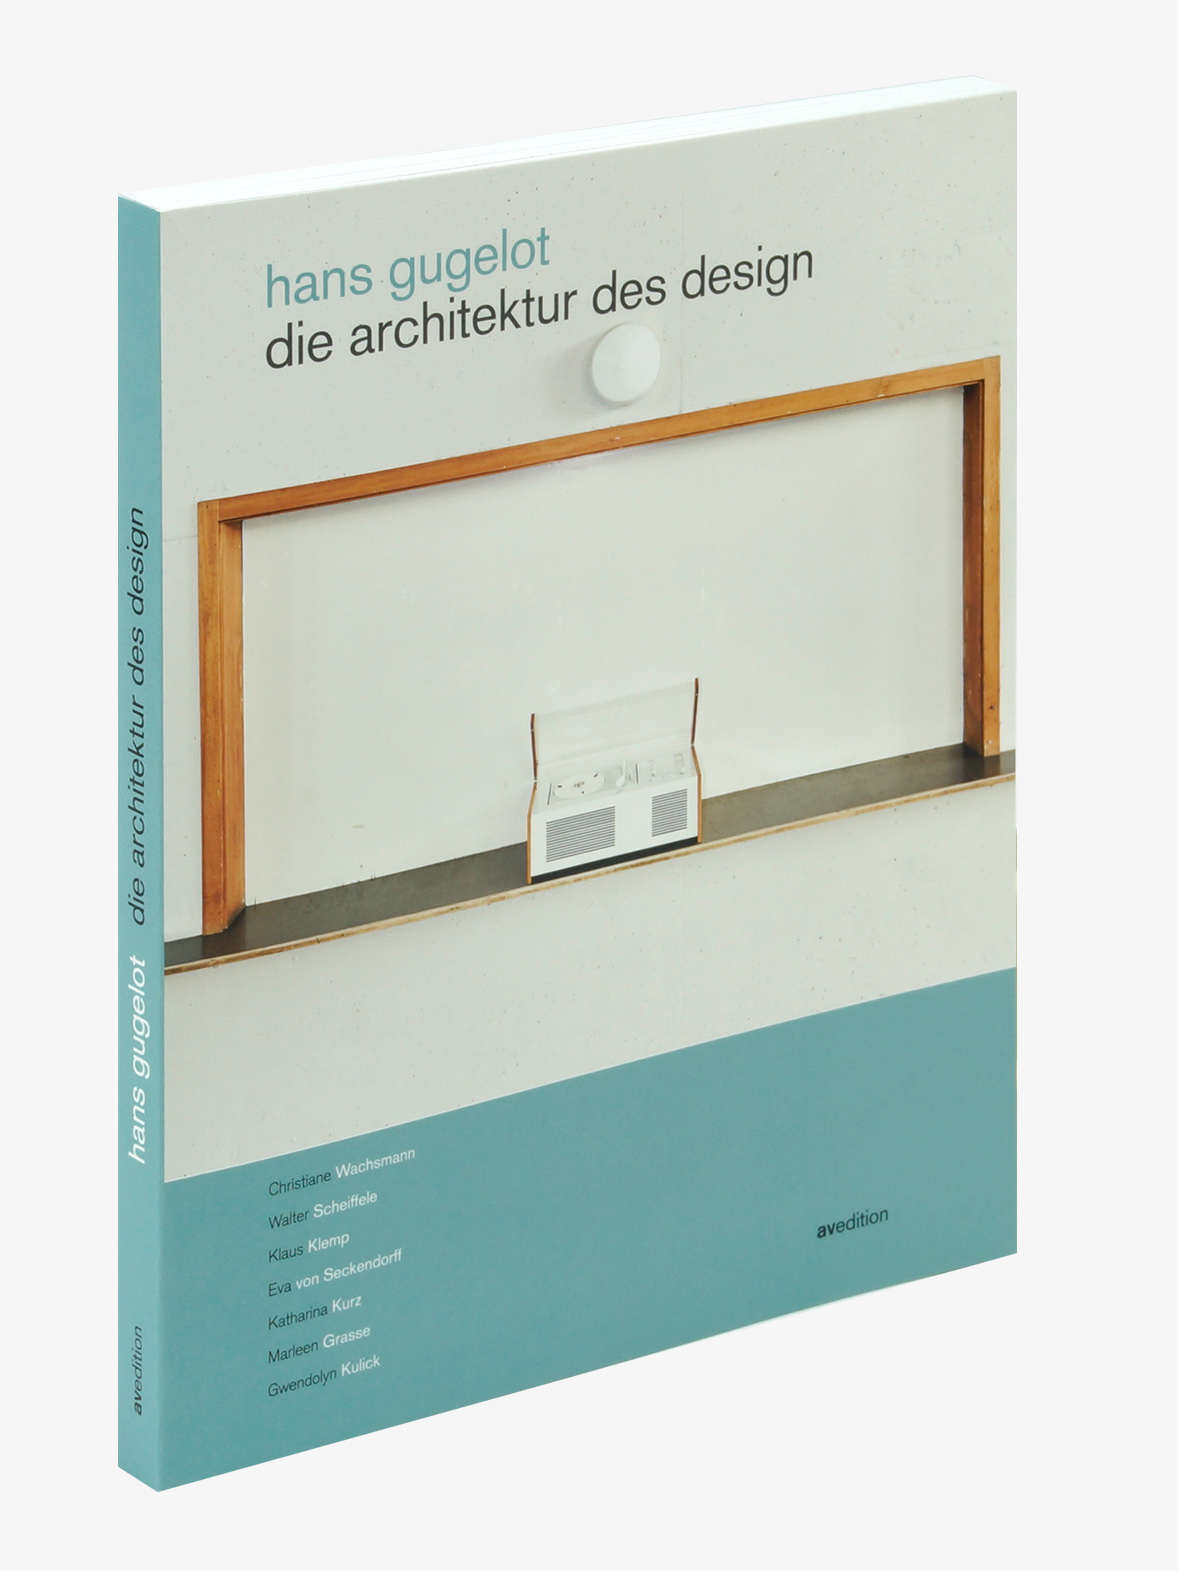 Hans Gugelot − Die Architektur des Design